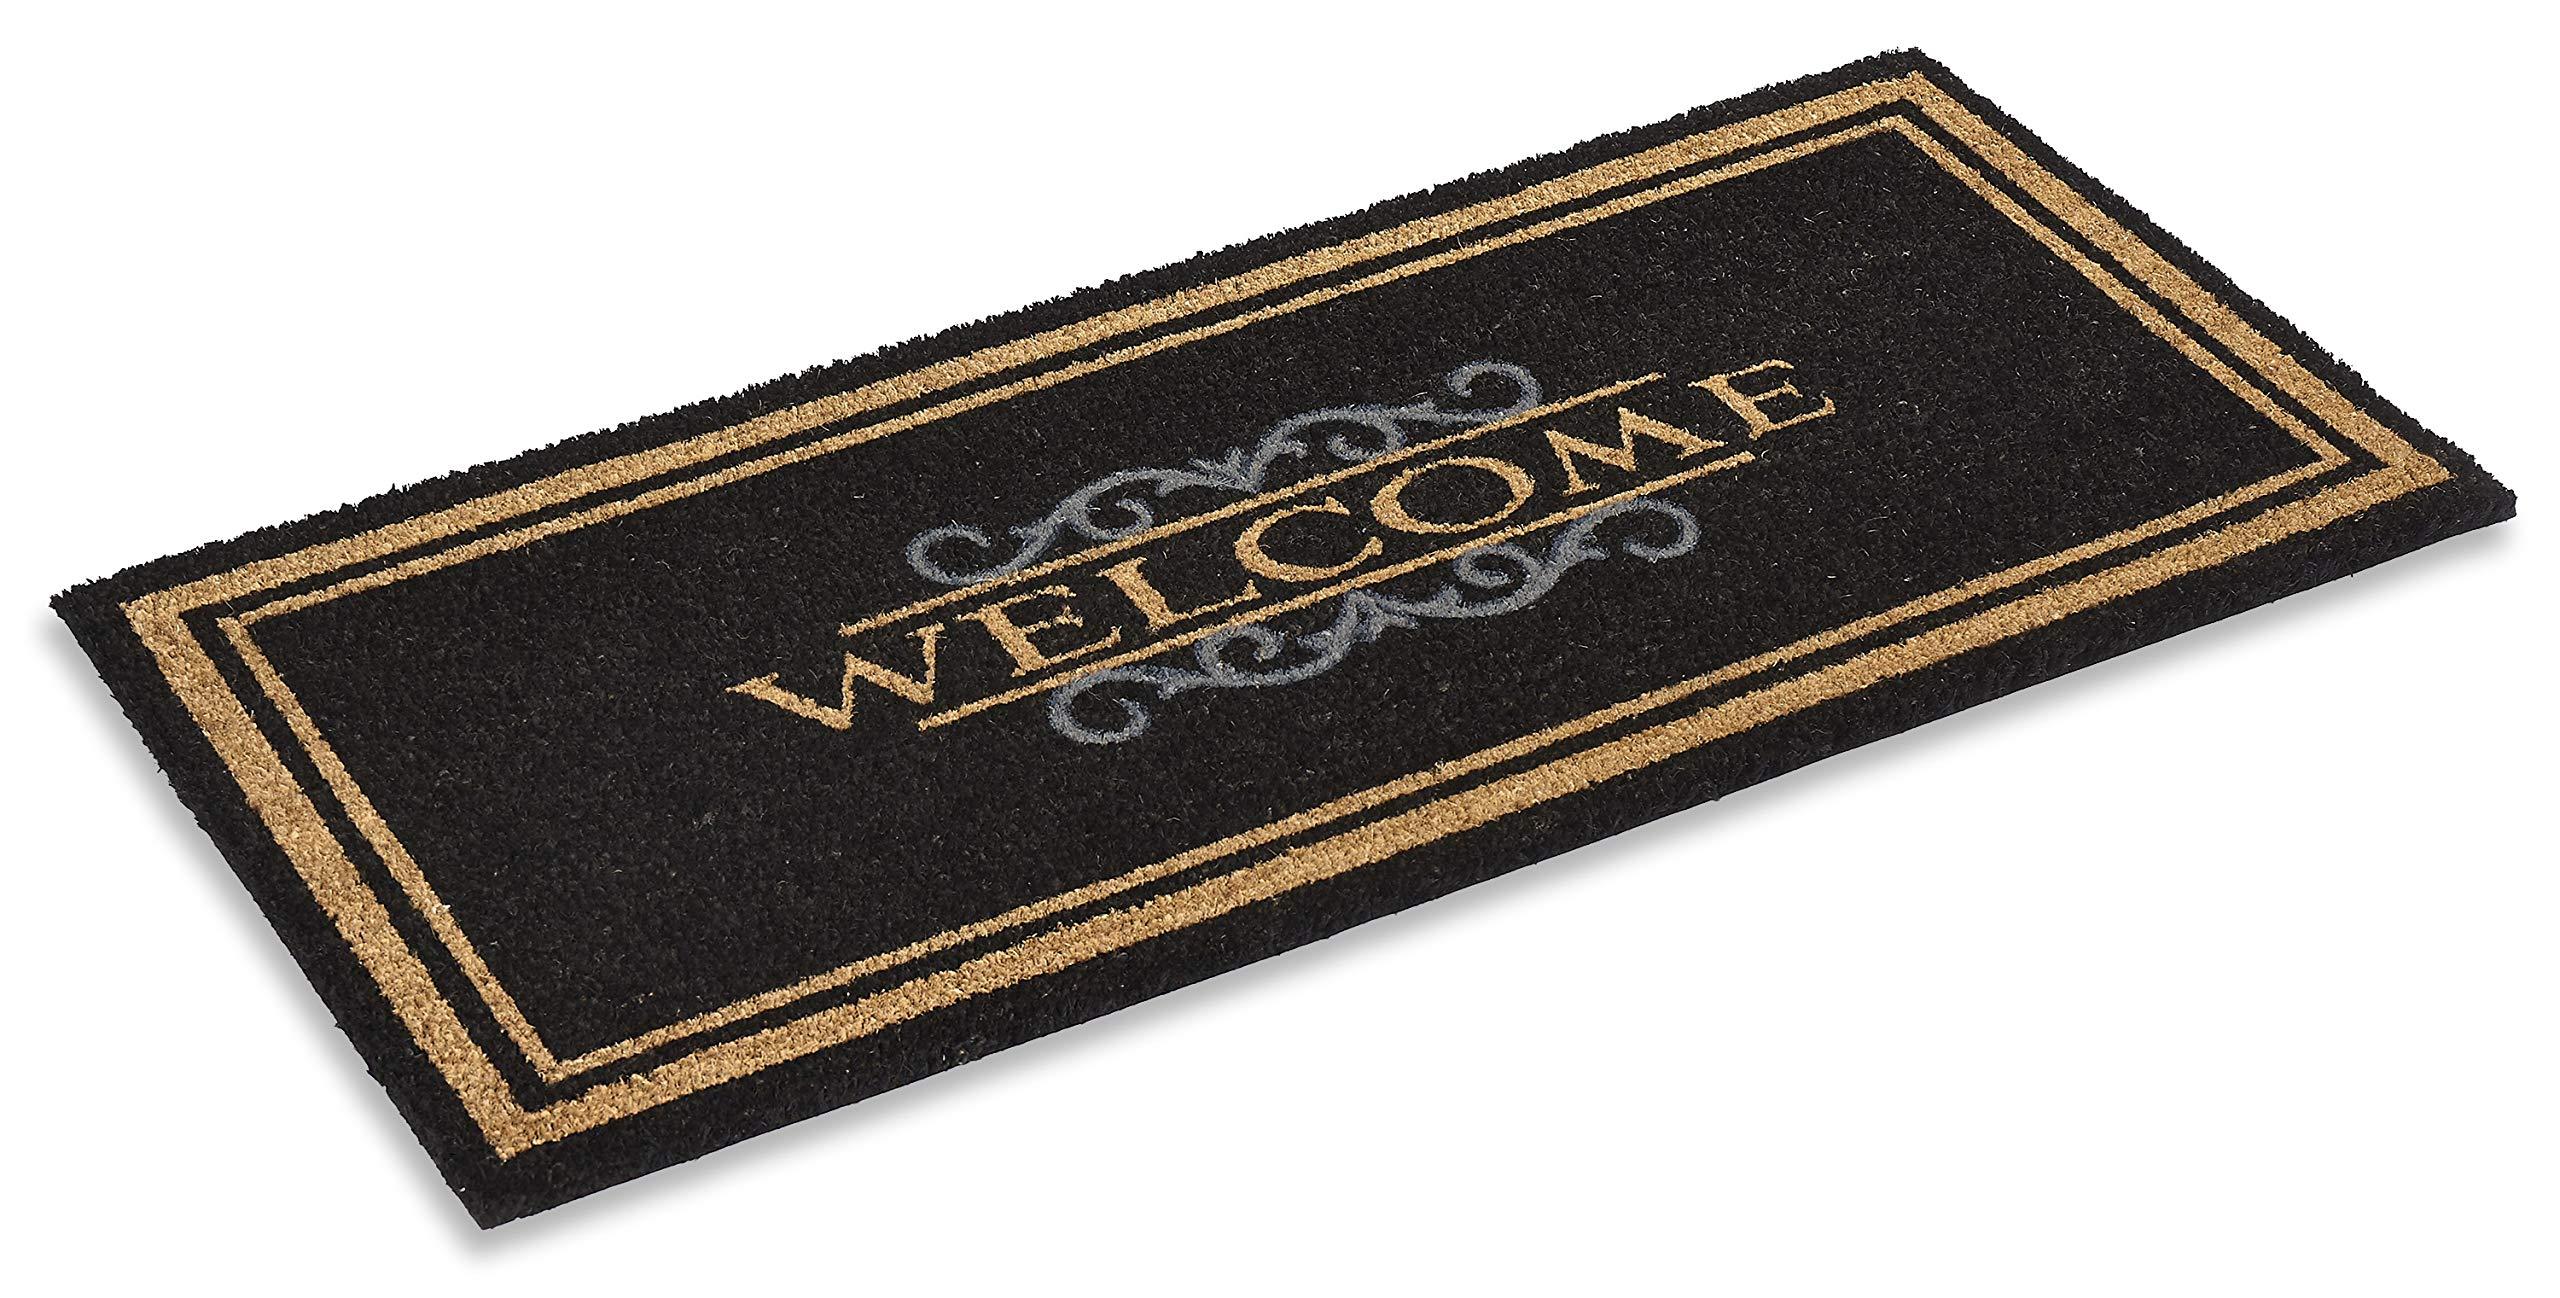 Kempf Printed Coco Coir Doormat Elegant Welcome Design 22'' X 47''